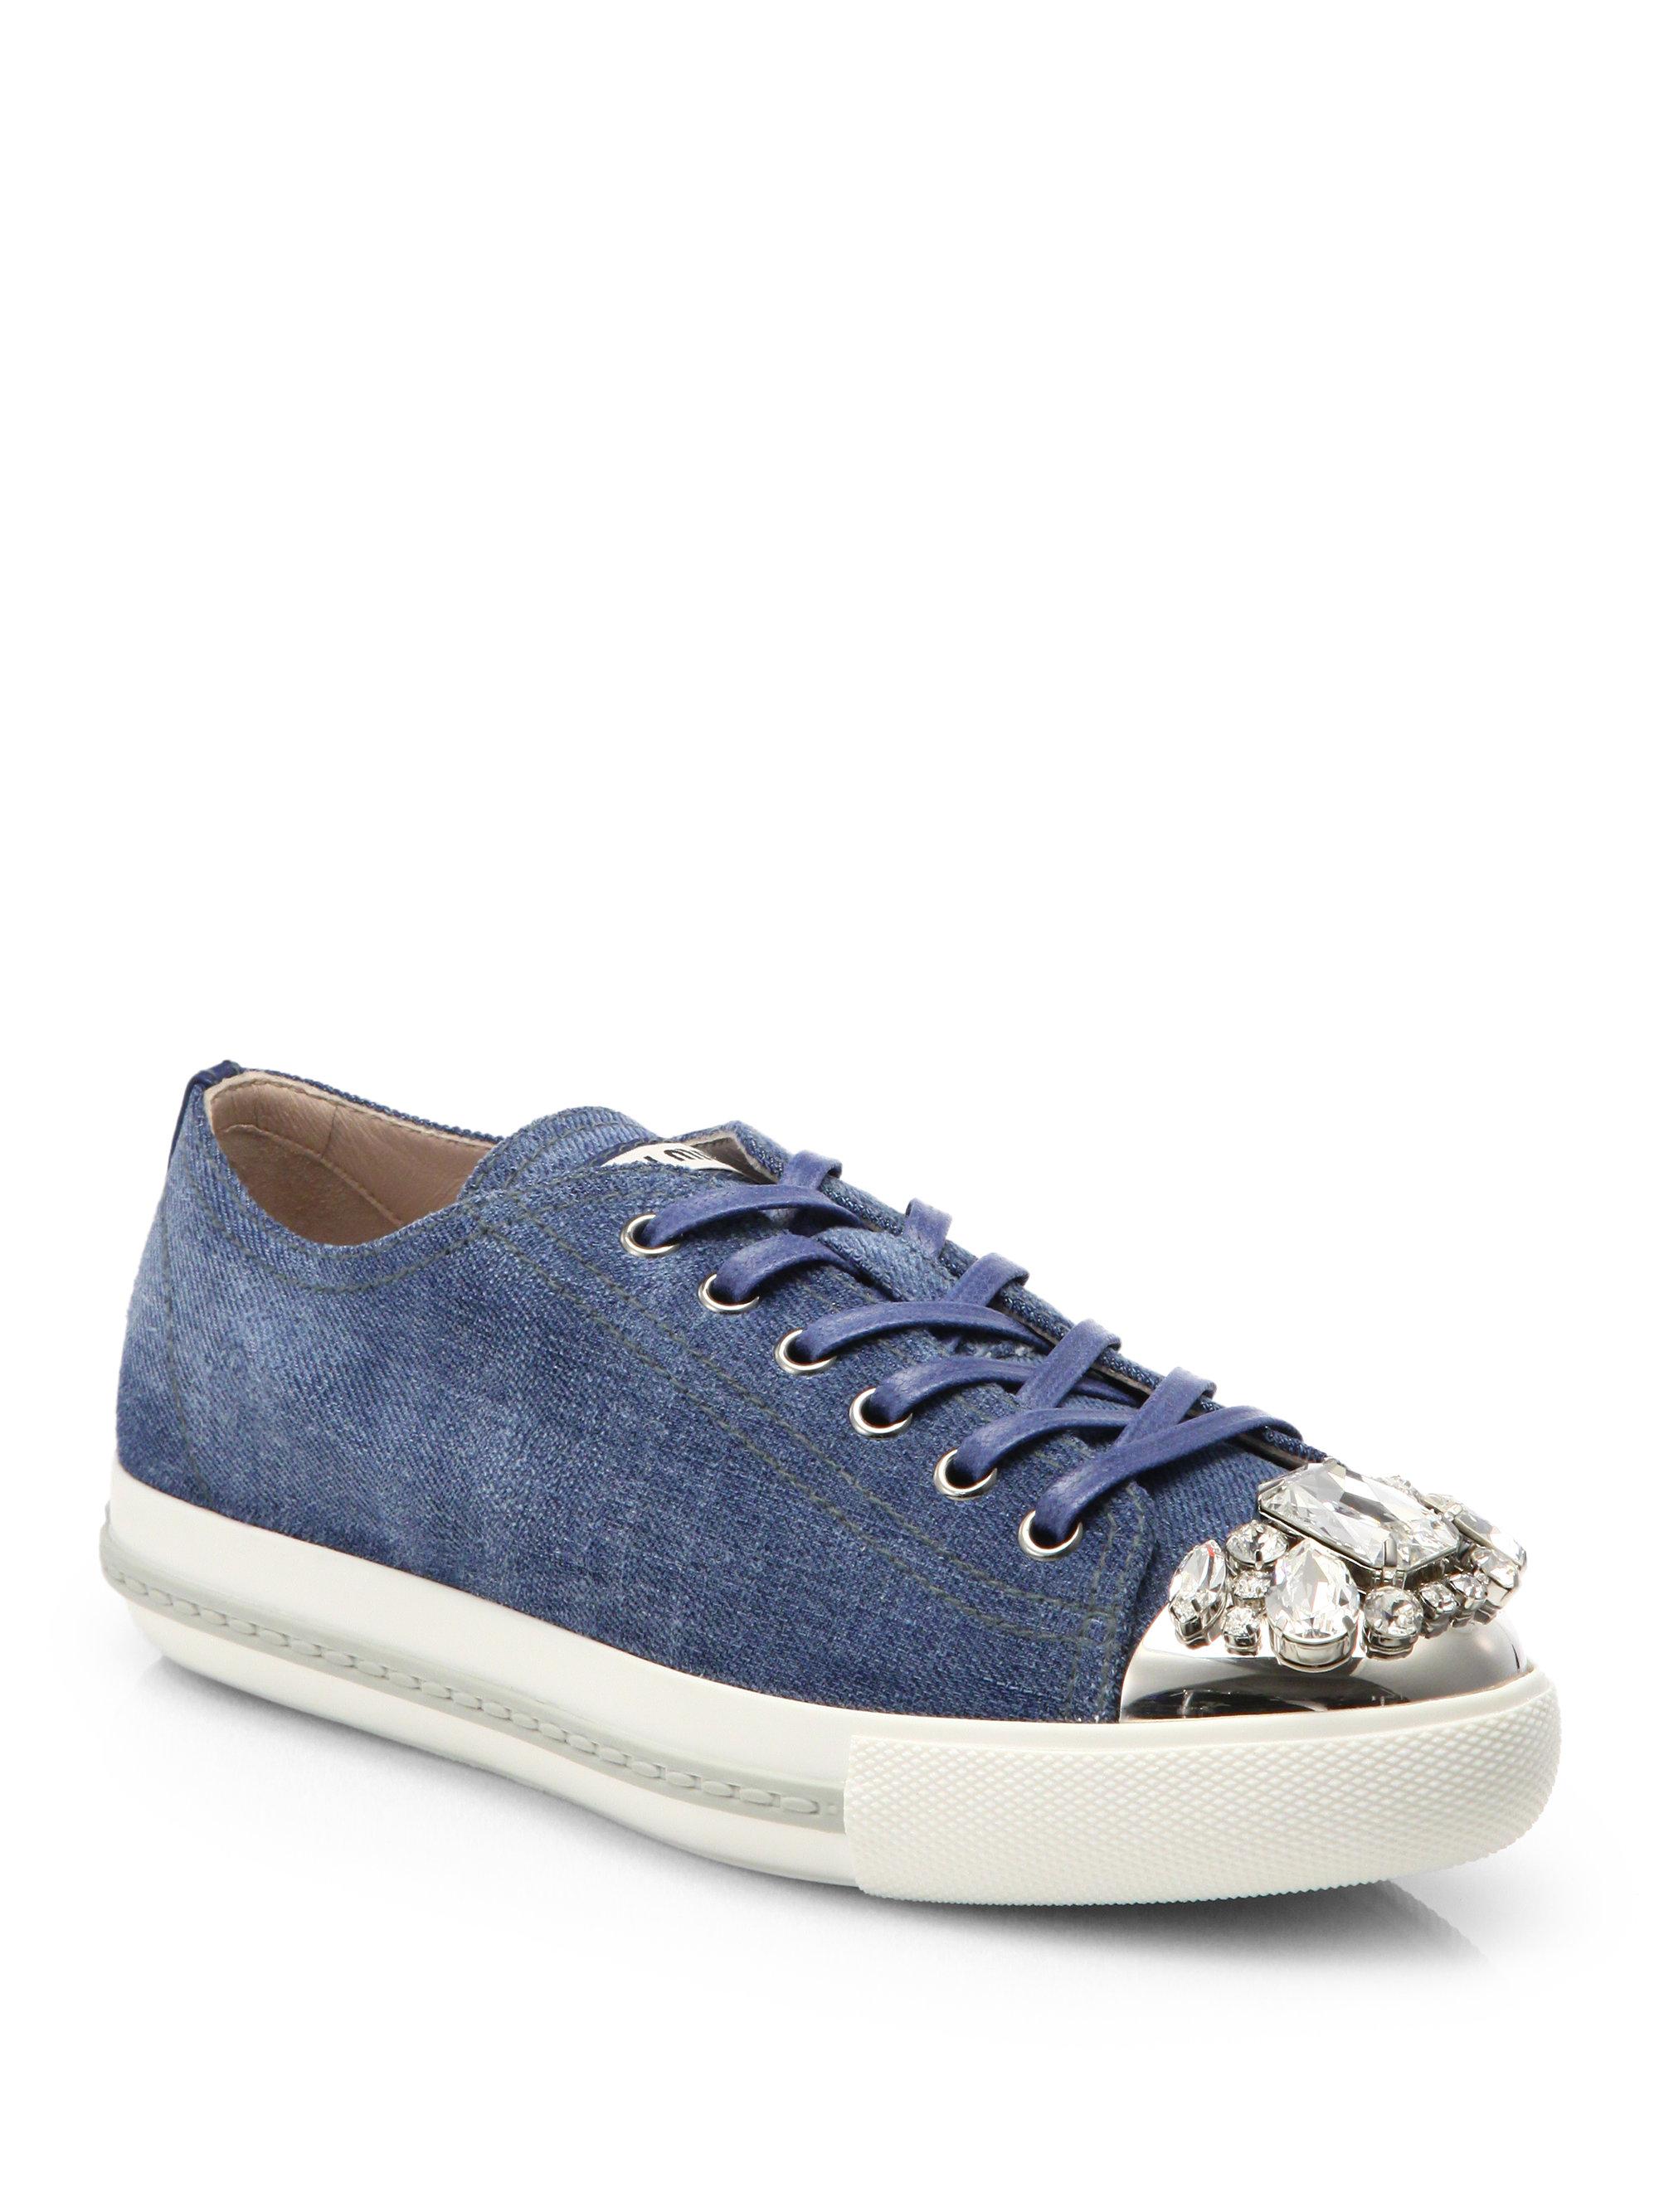 buy popular a23c6 1f481 Sneakers Miu Miu | Mount Mercy University